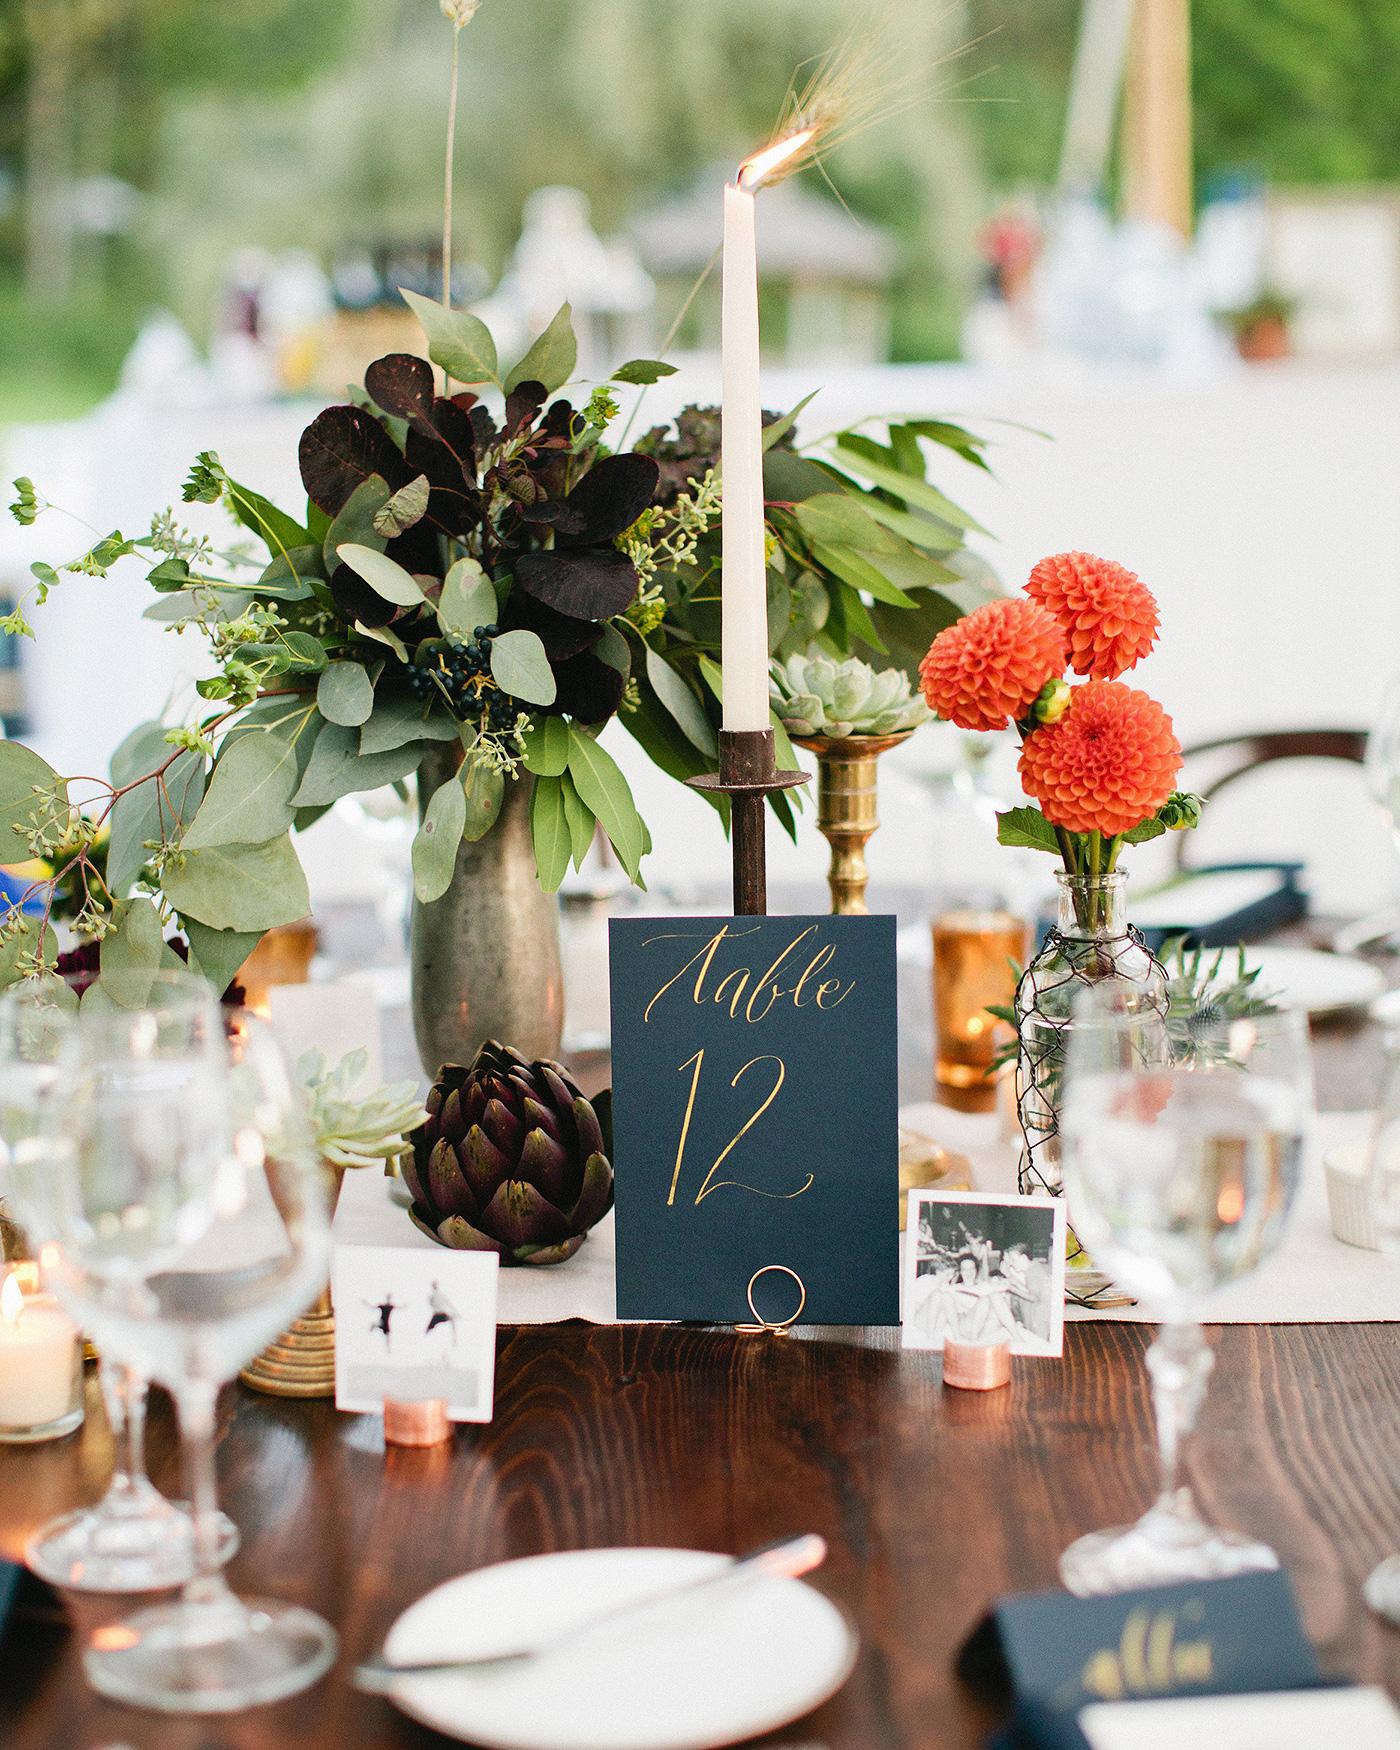 jesse-nate-wedding-centerpiece-0920-s113063-0716.jpg